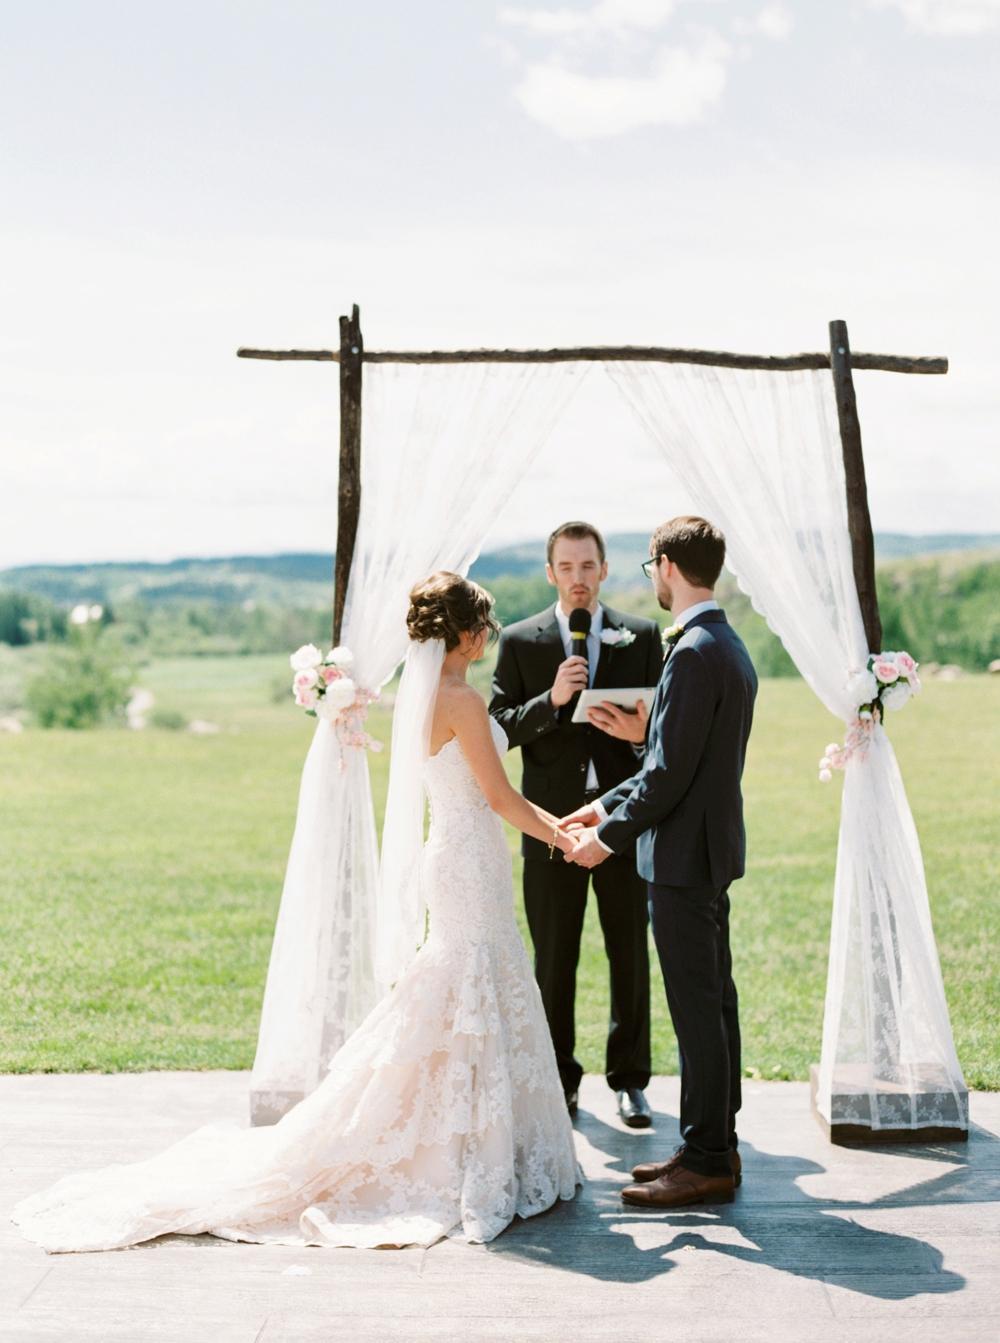 Calgary Wedding Photographers   Cochrane Ranchehouse Wedding   Cochrane wedding photography   Country wedding   outdoor wedding ceremony